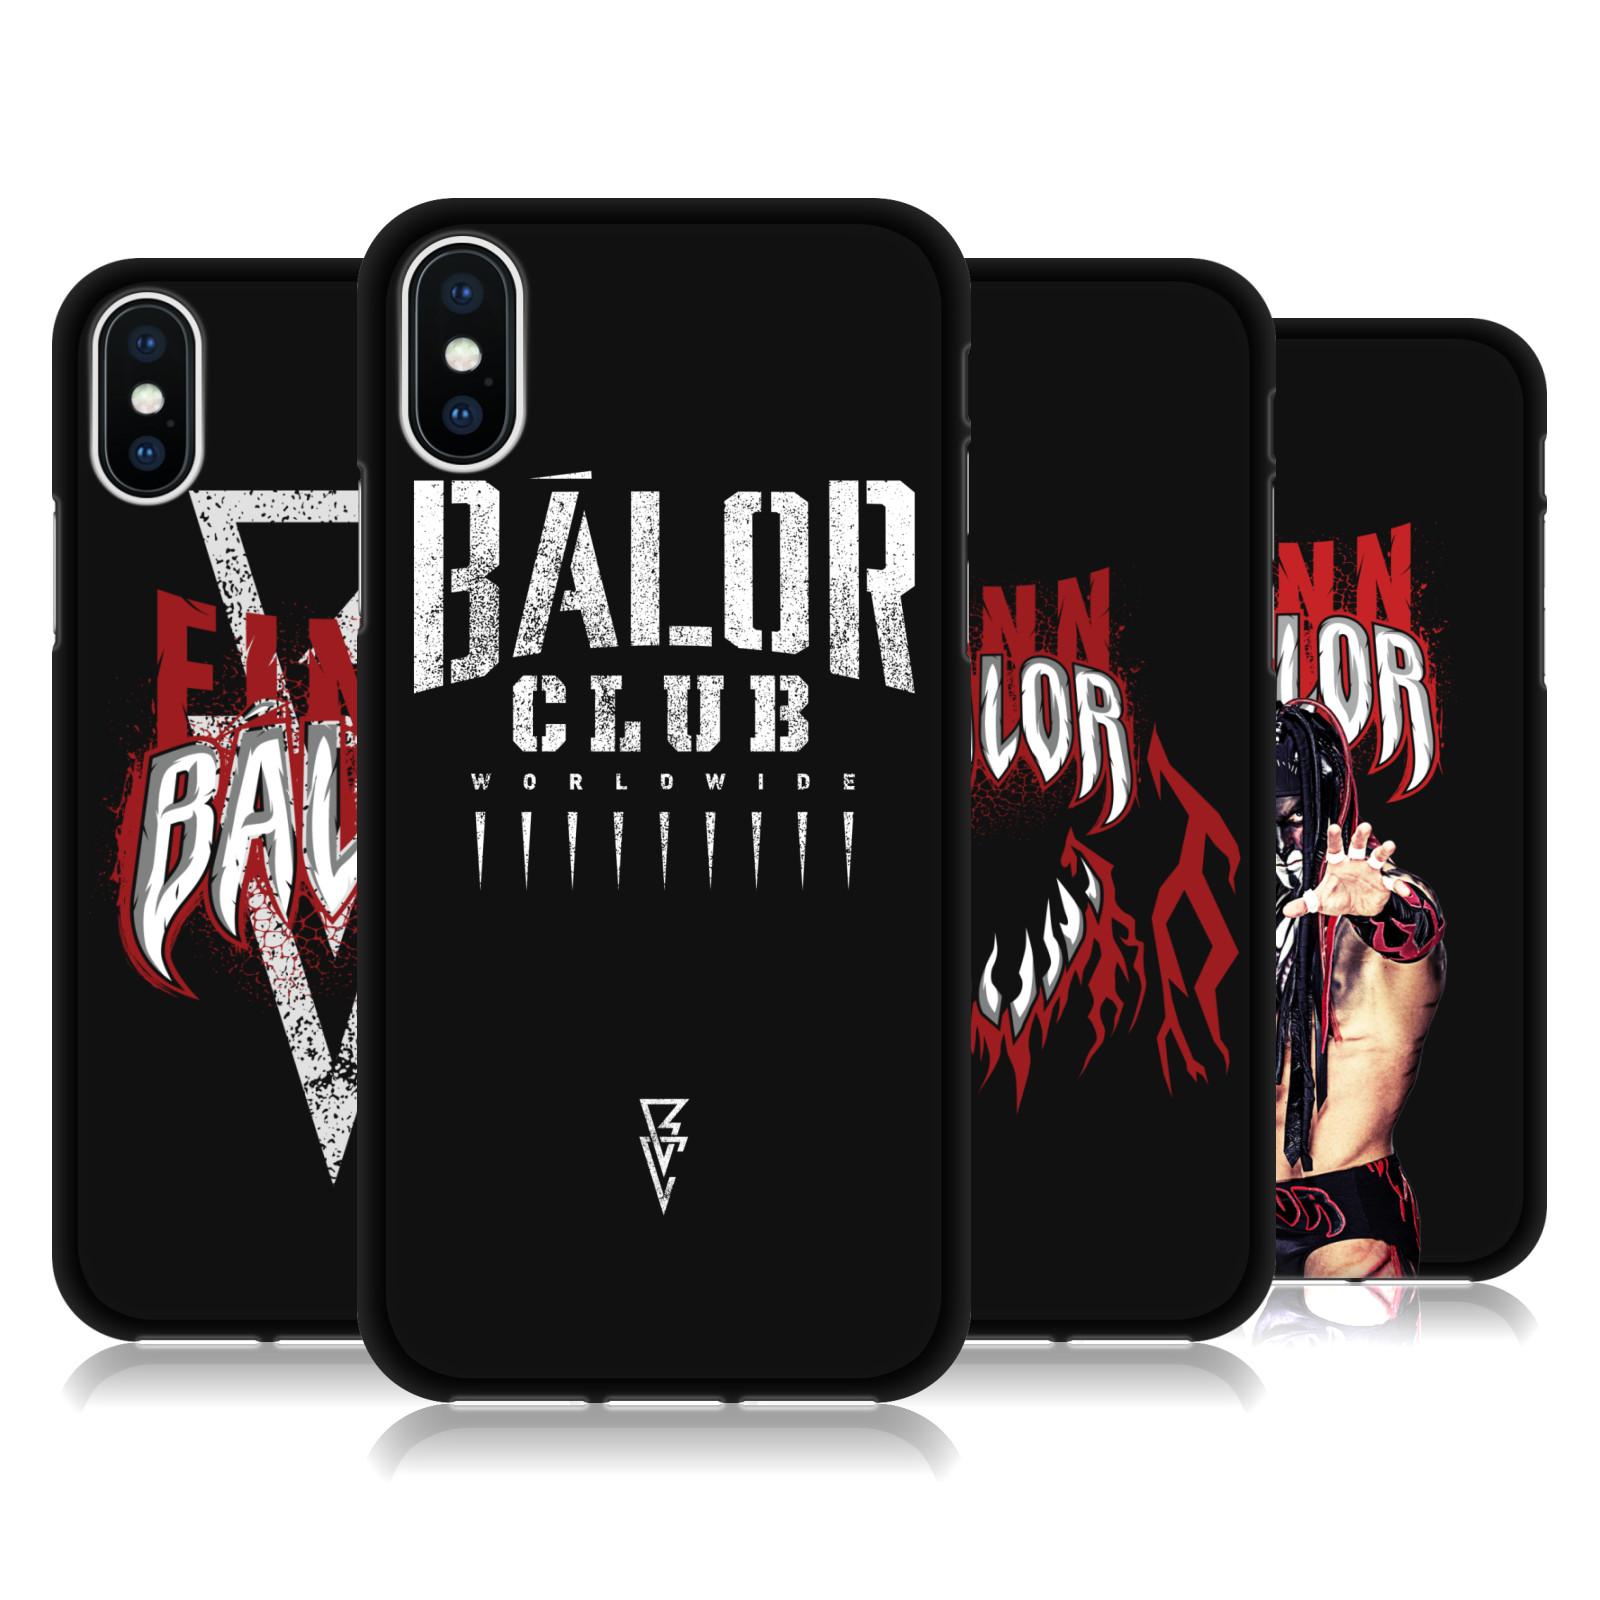 WWE <!--translate-lineup-->Finn Bálor 2<!--translate-lineup-->